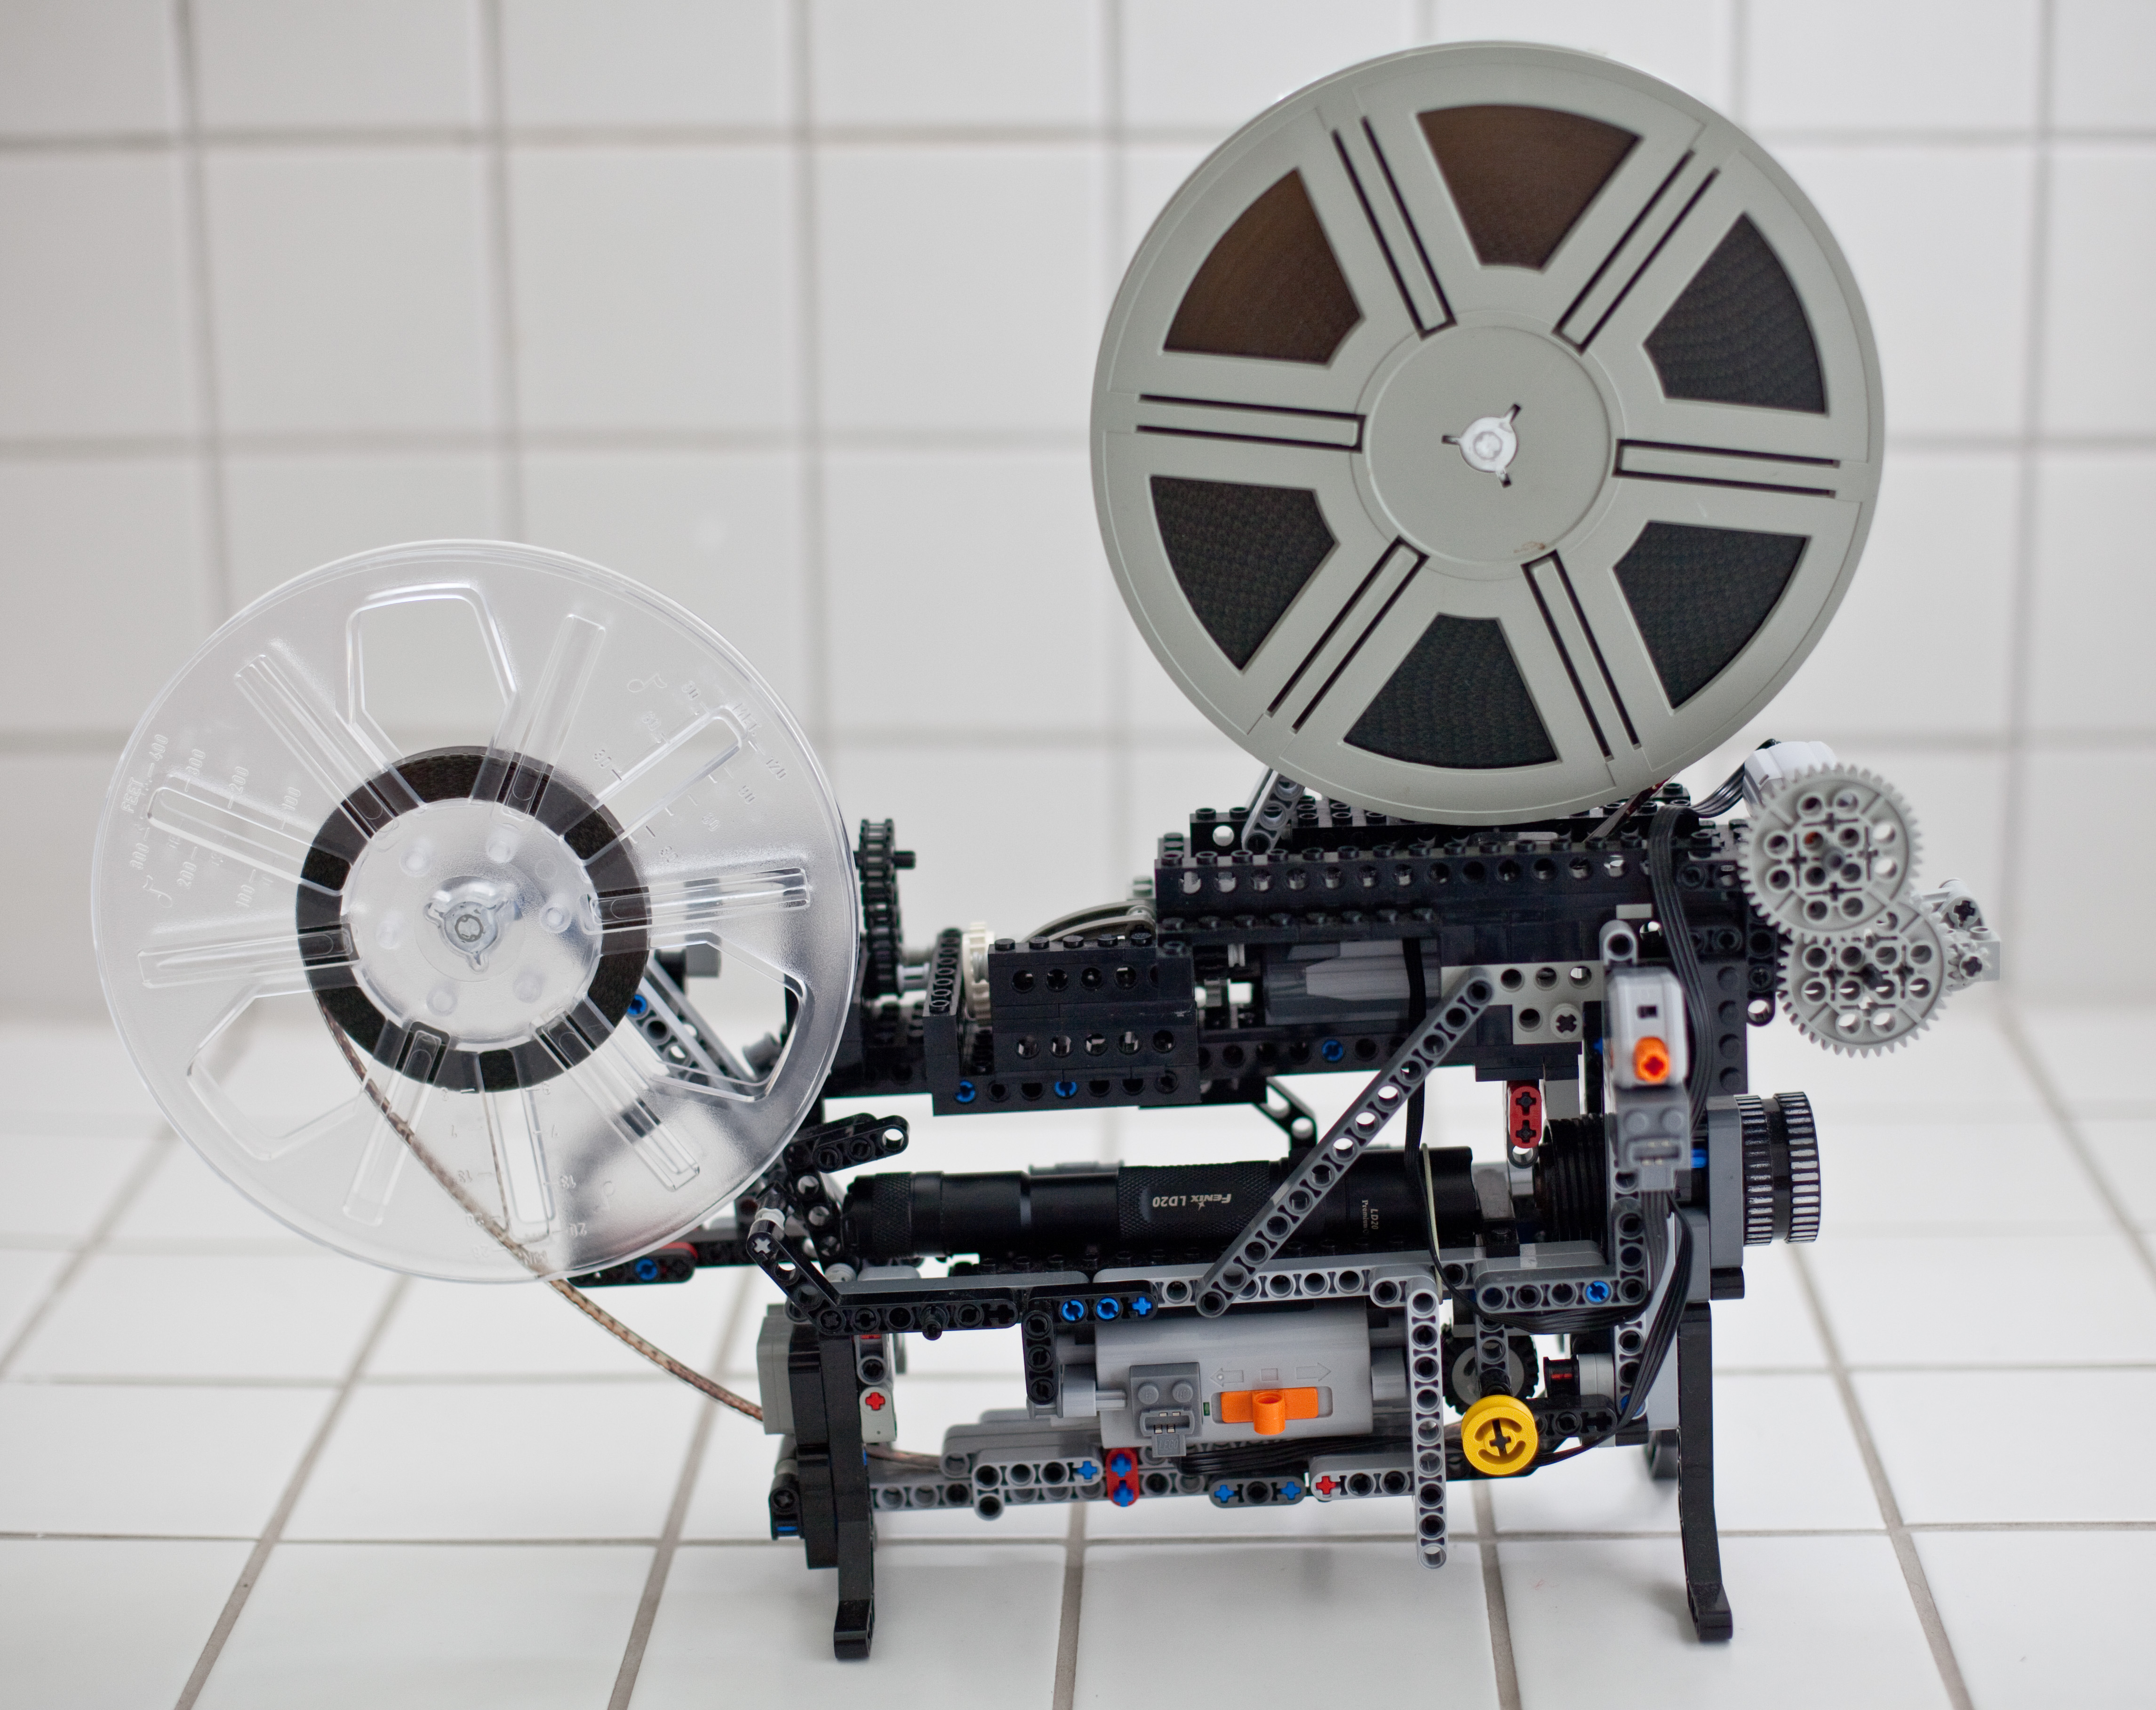 Lego Technic Super-8 Projektor